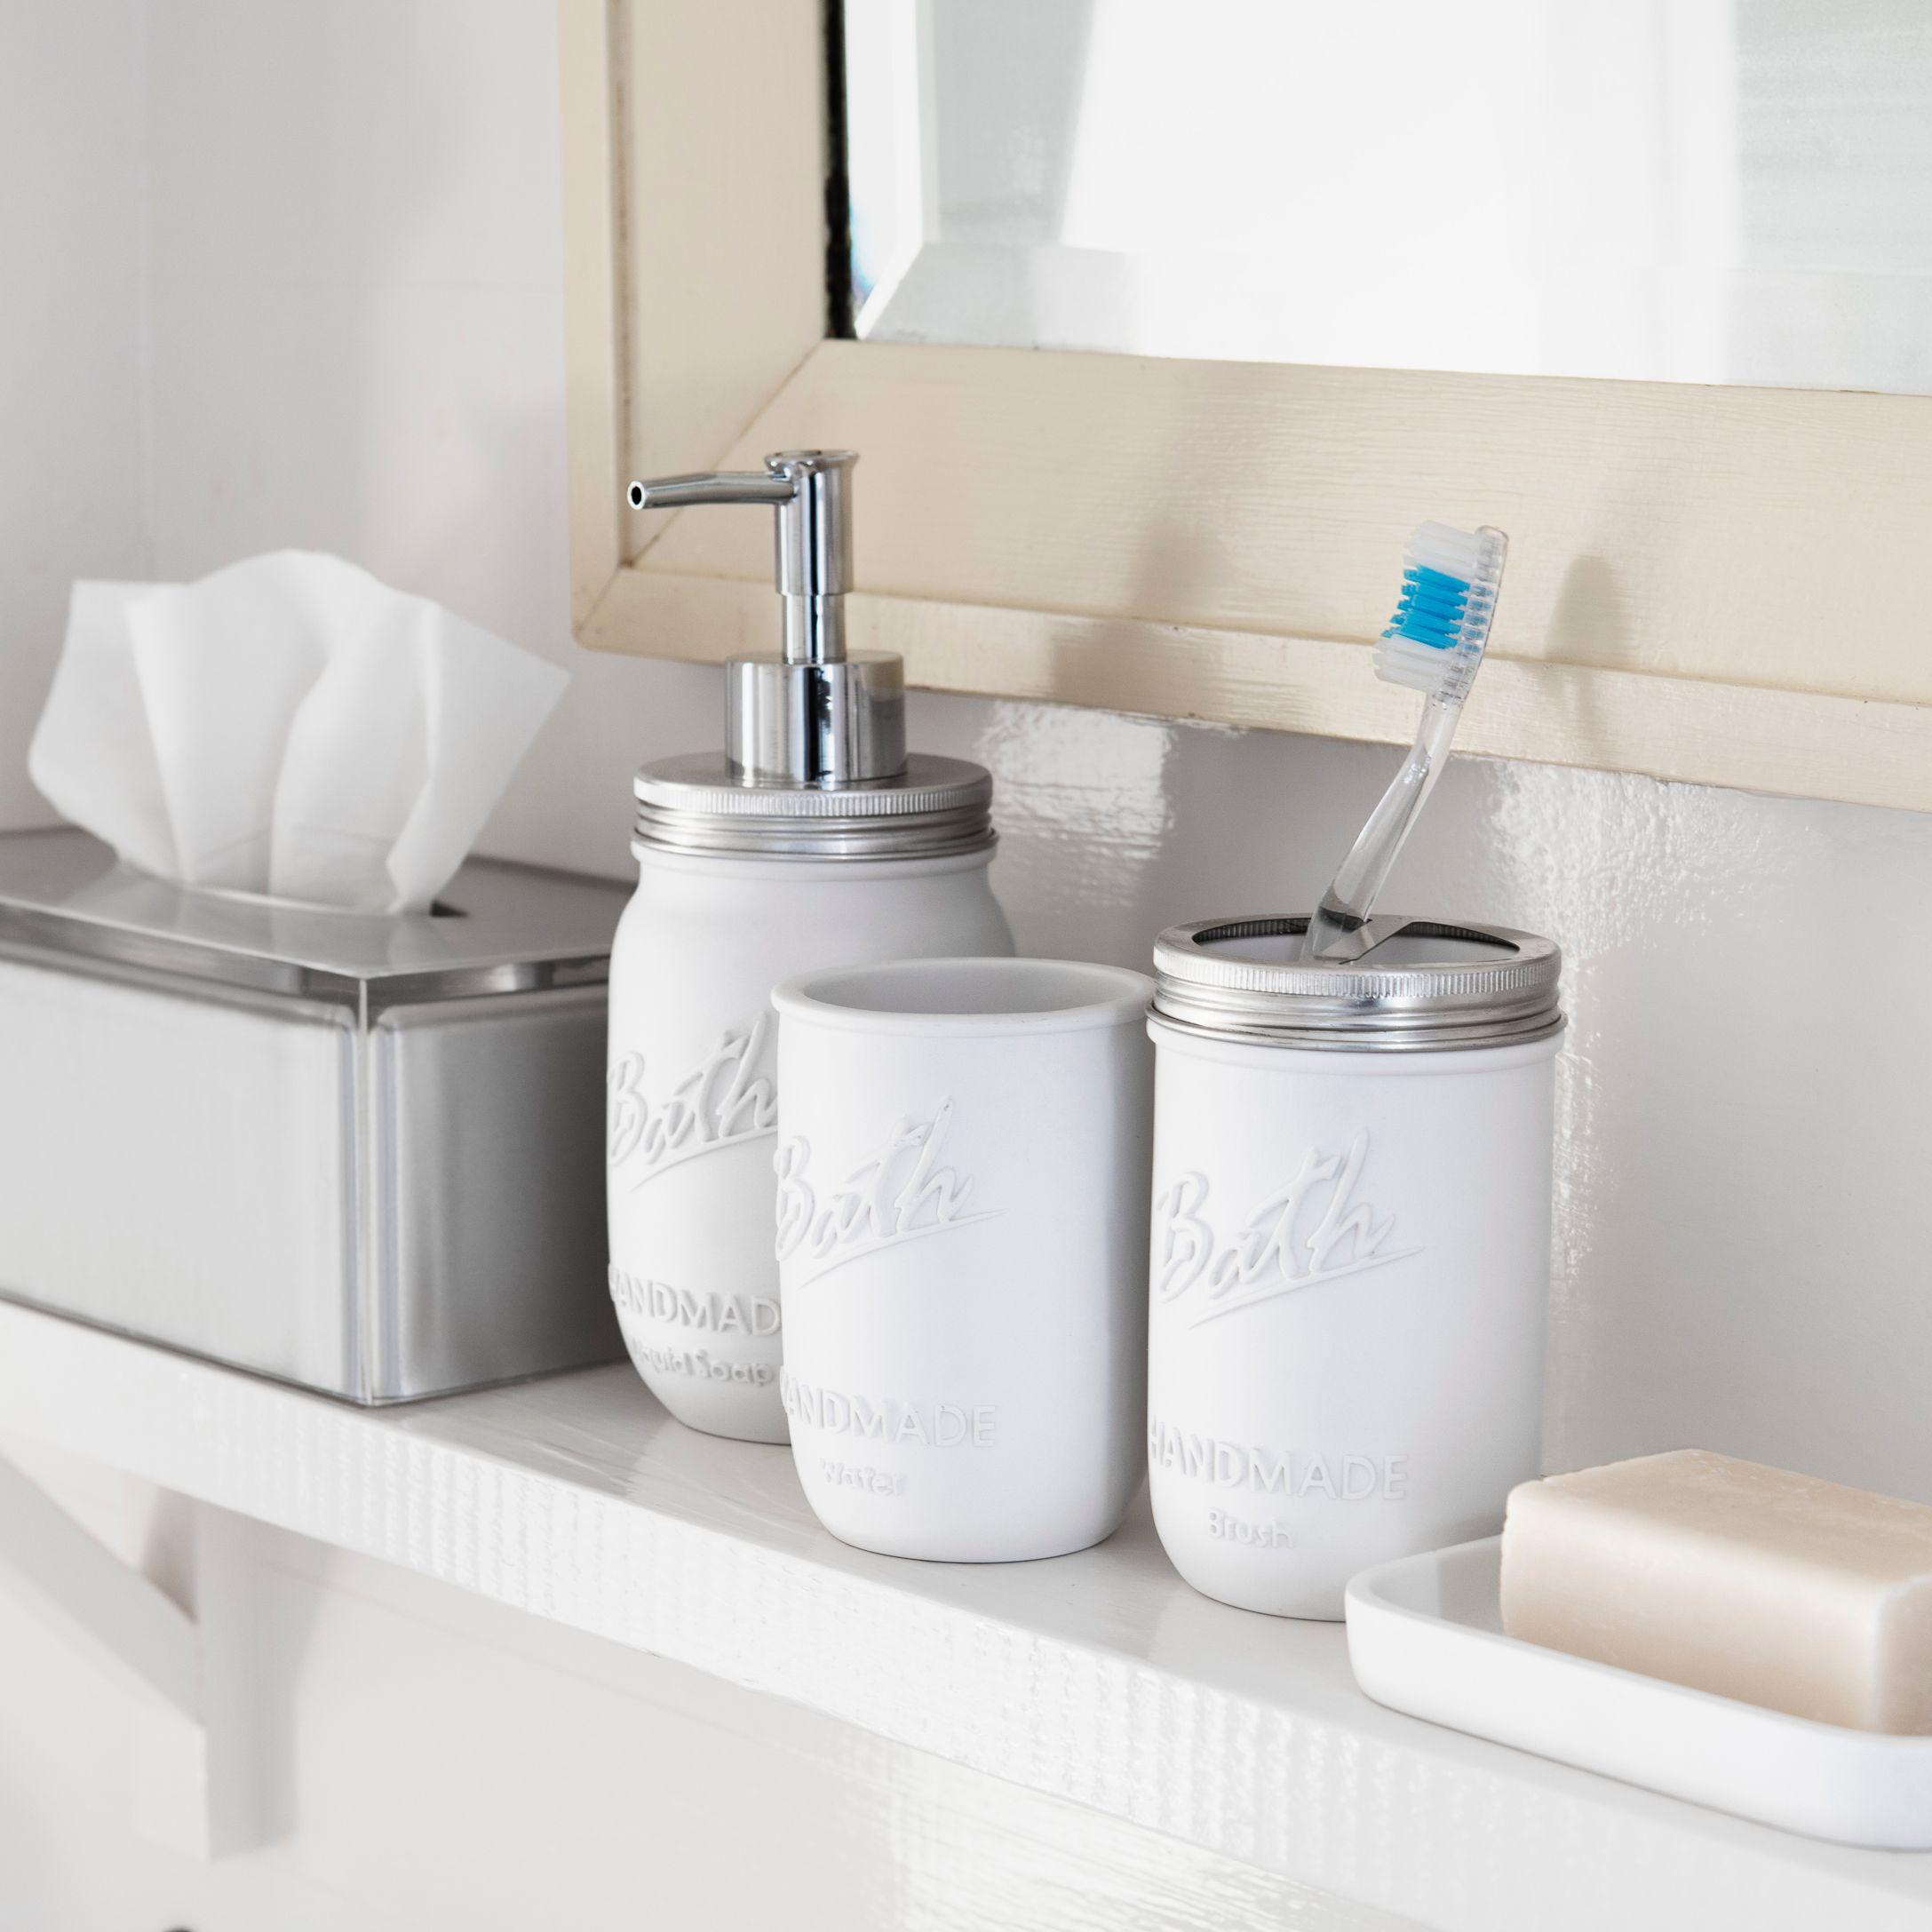 vintage jar accessories simons bathroom chalet masonjar decor maisonsimons